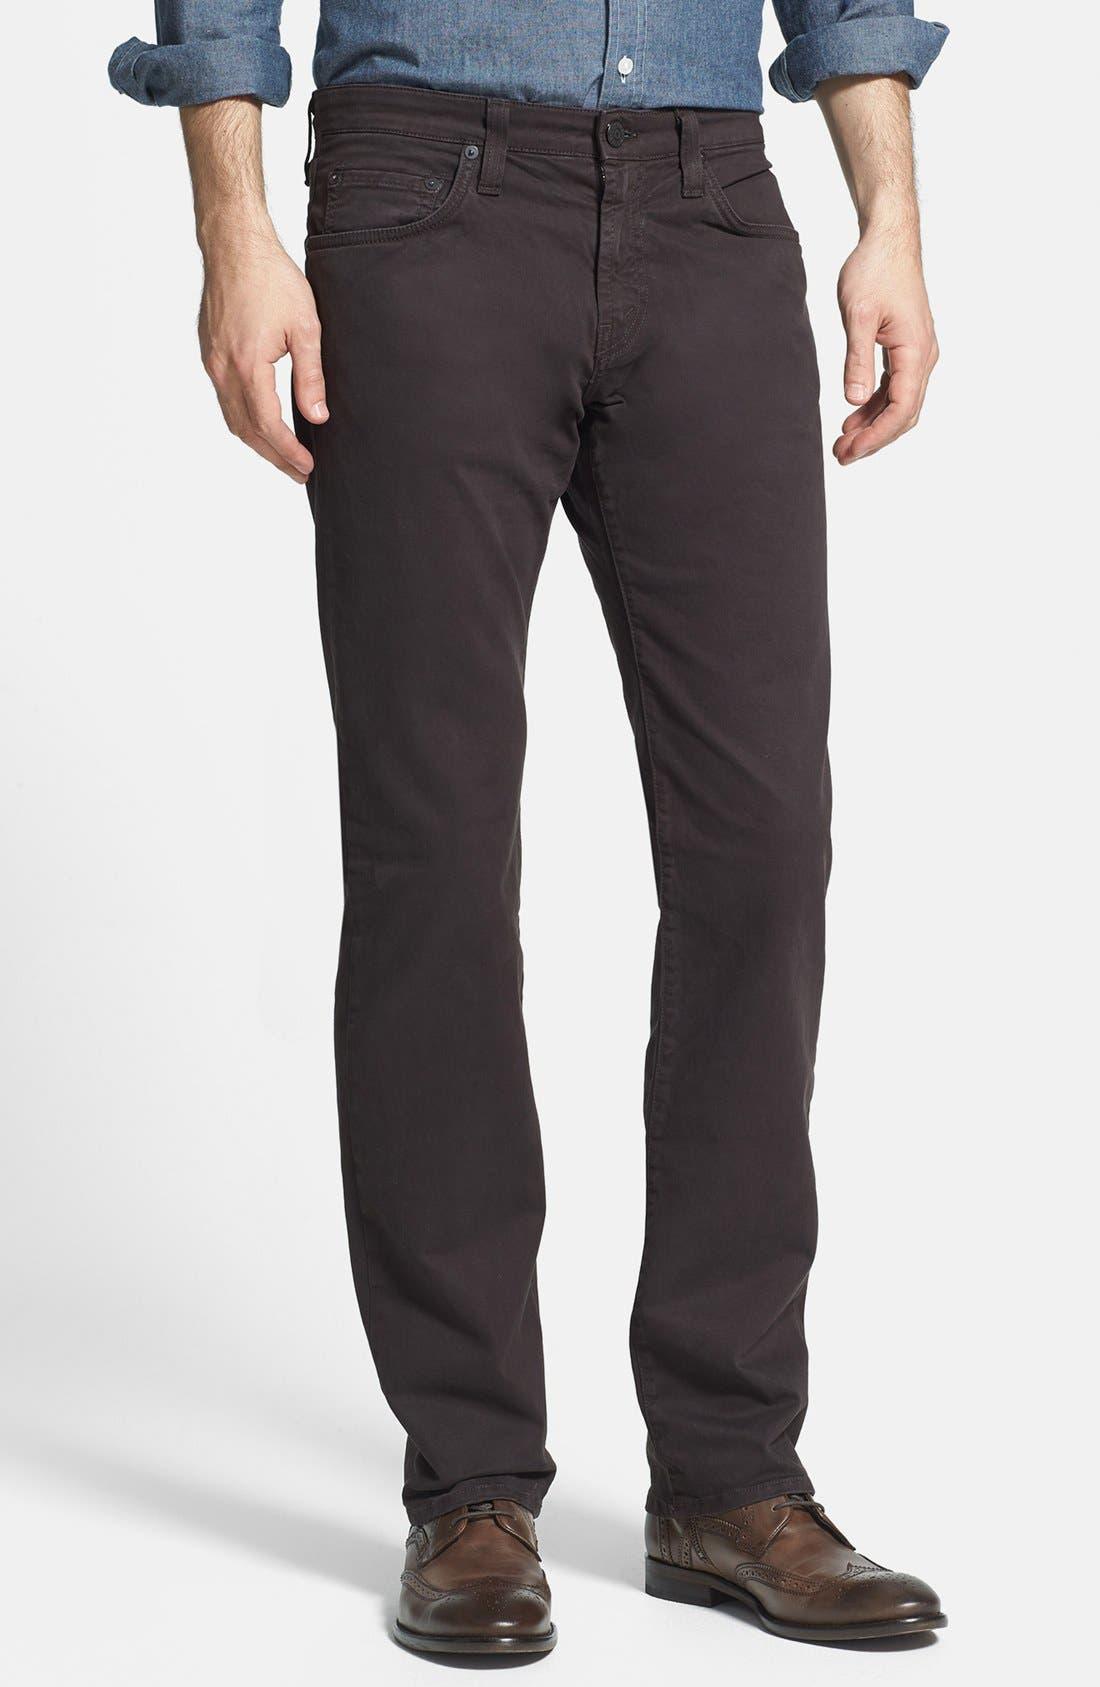 'Kane' Slim Fit Cotton Twill Pants,                             Main thumbnail 9, color,